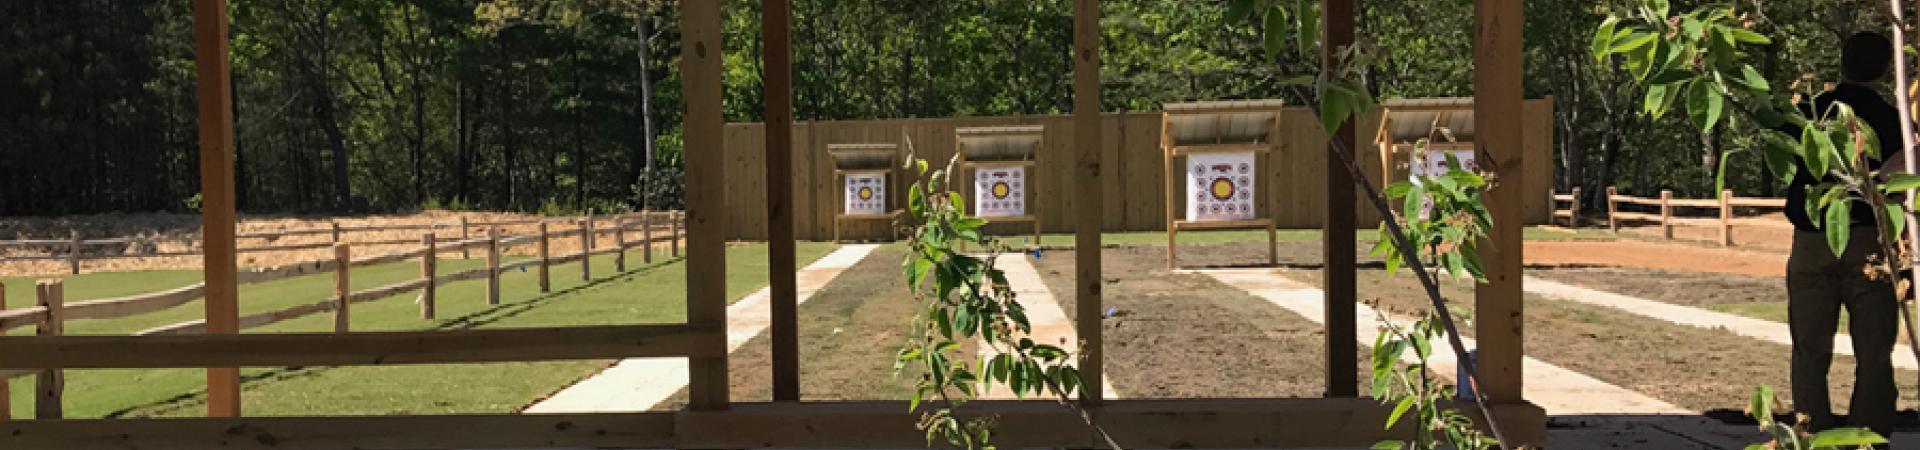 Archery Range at Unicoi